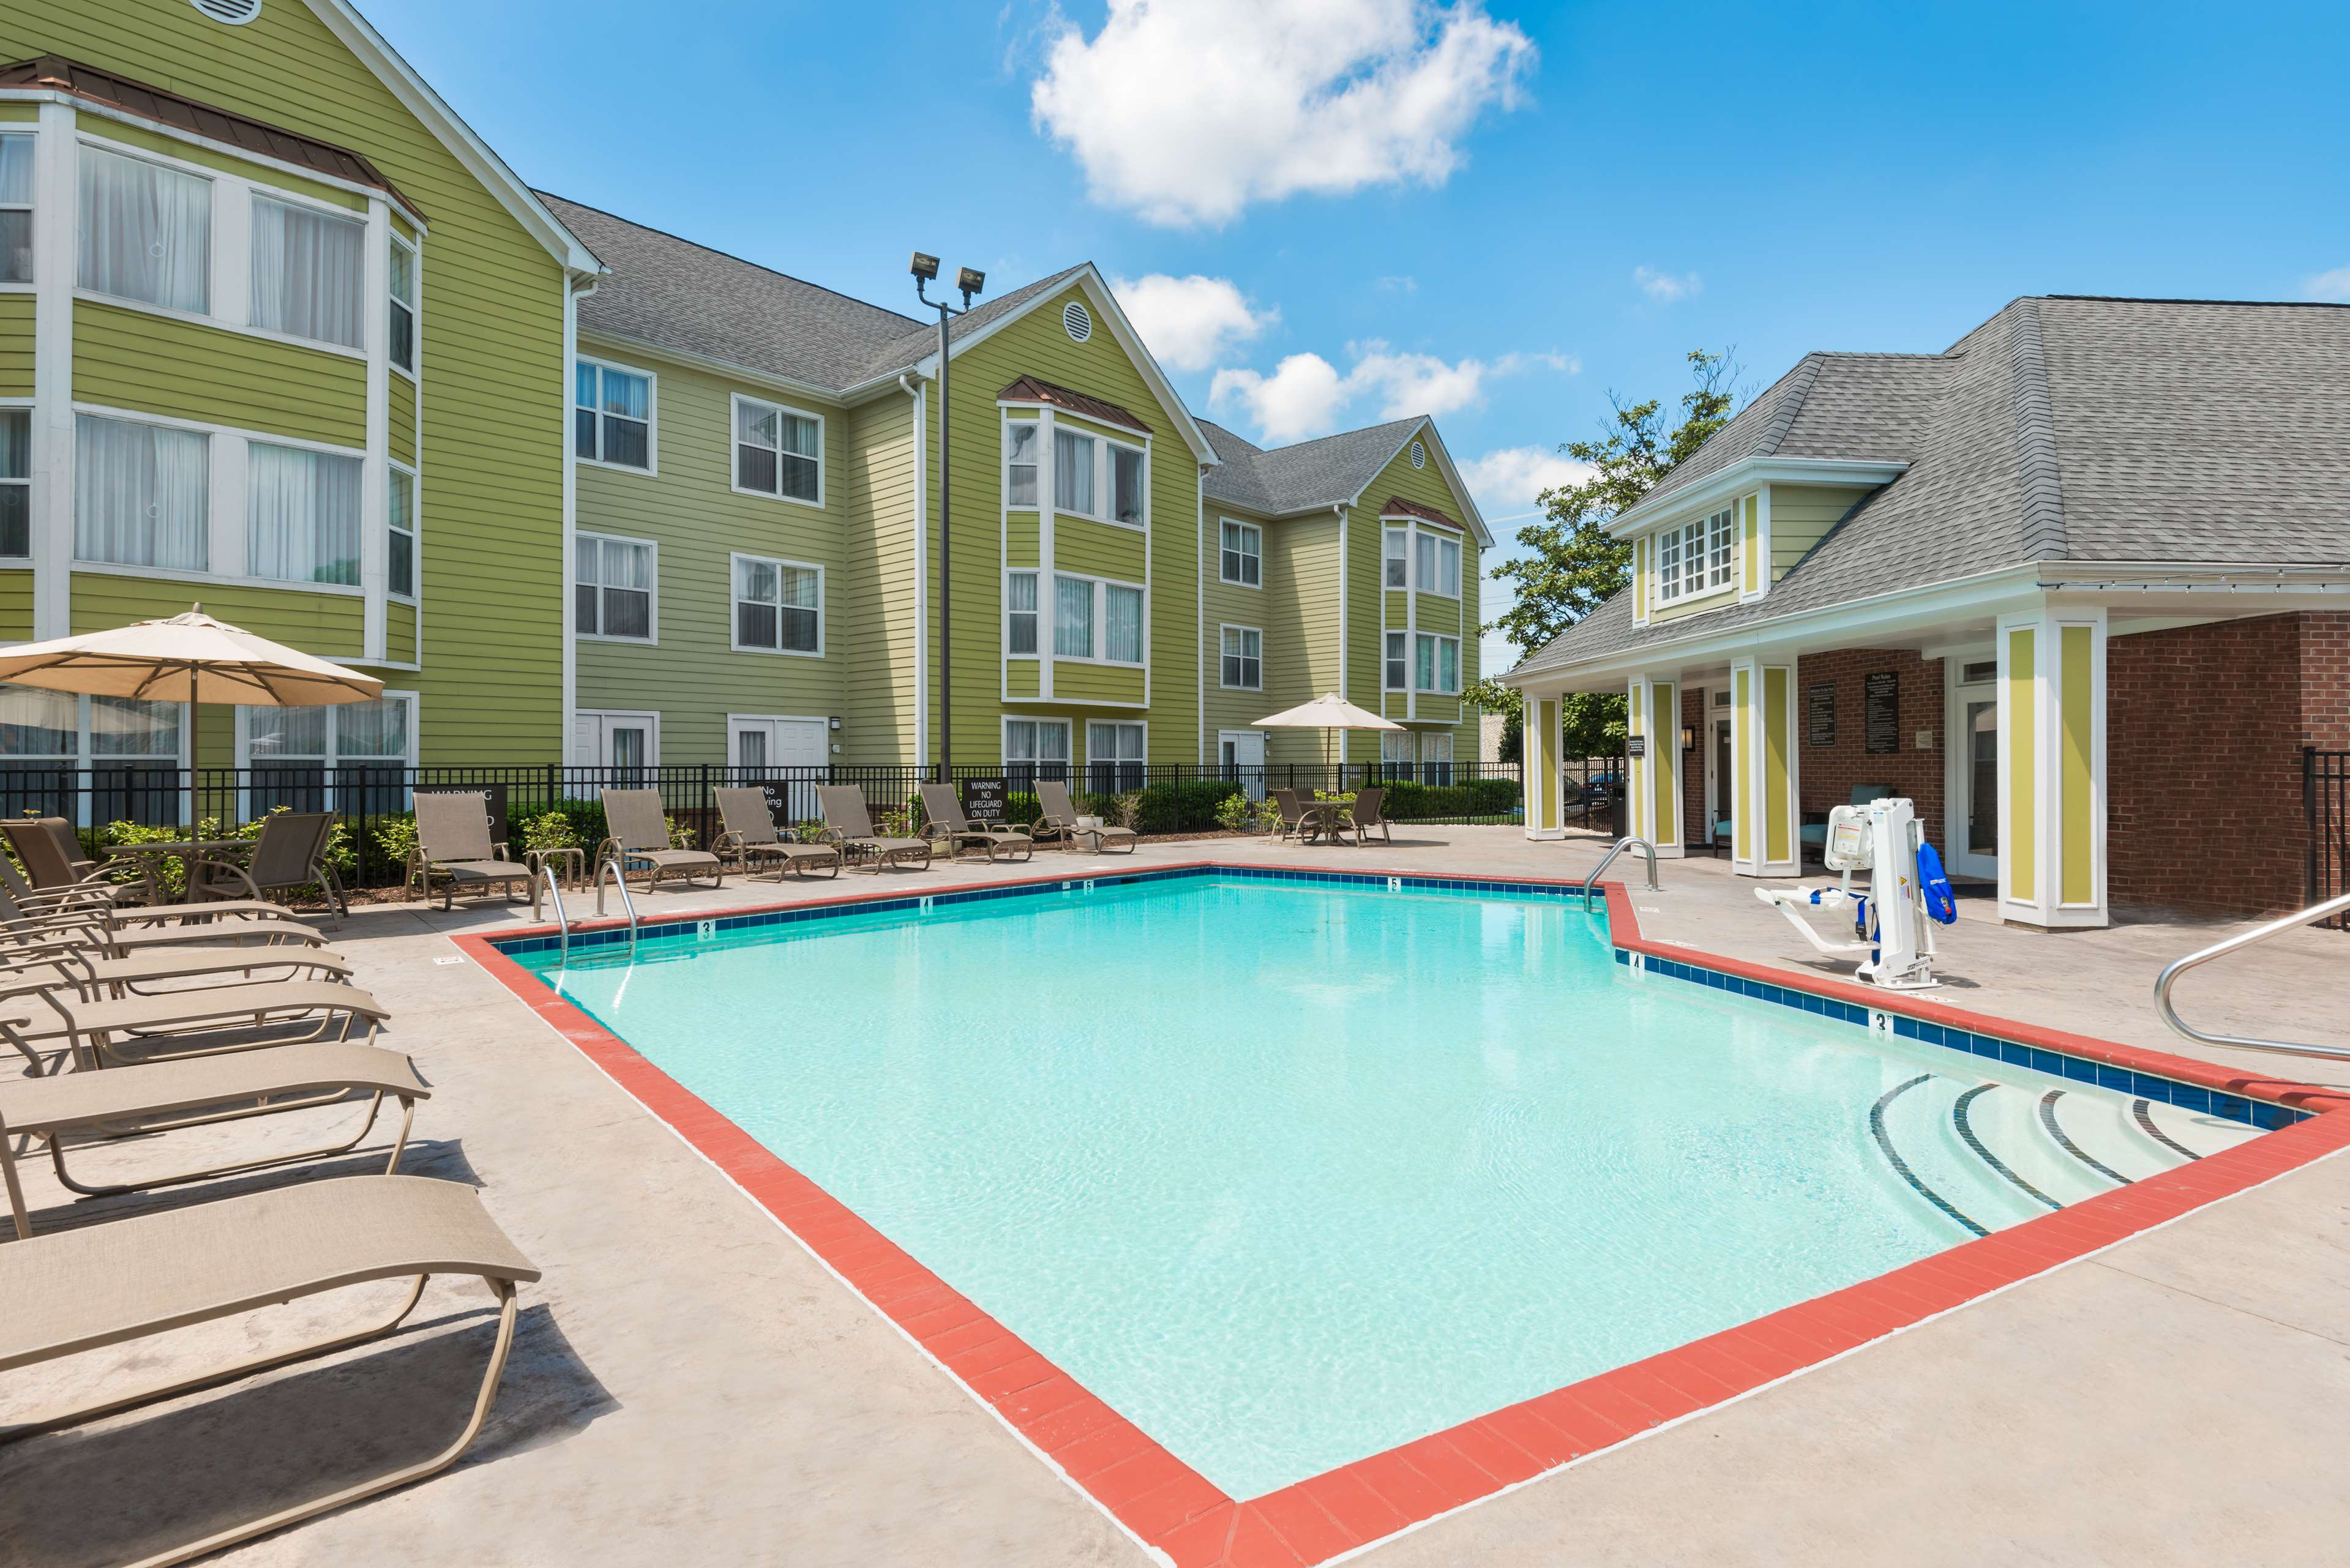 Homewood Suites by Hilton Charlotte-North/Univ Research Park image 4